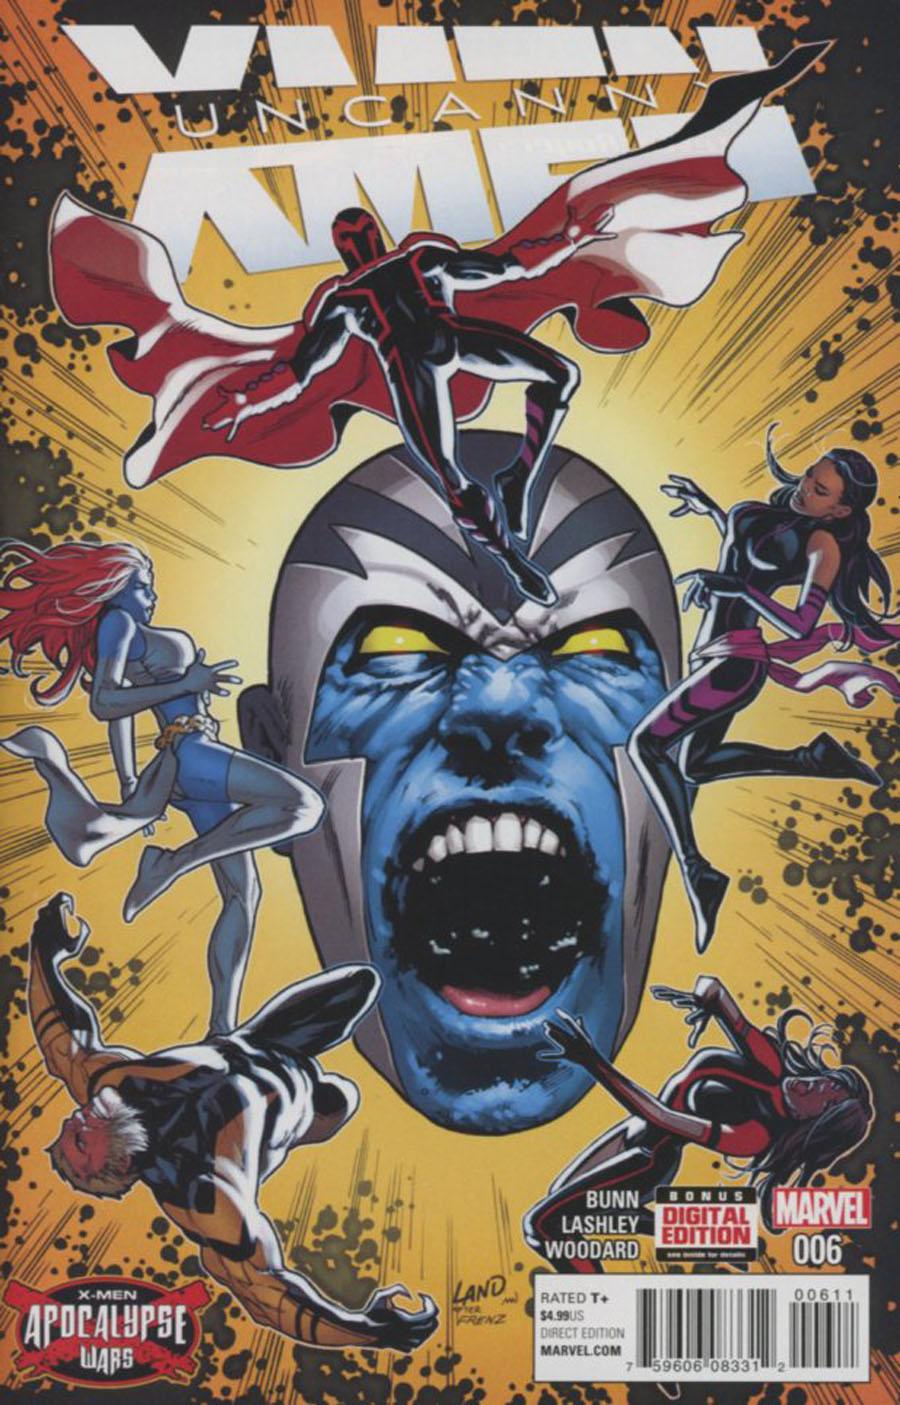 Uncanny X-Men Vol 4 #6 Cover A Regular Greg Land Cover (X-Men Apocalypse Wars Tie-In)